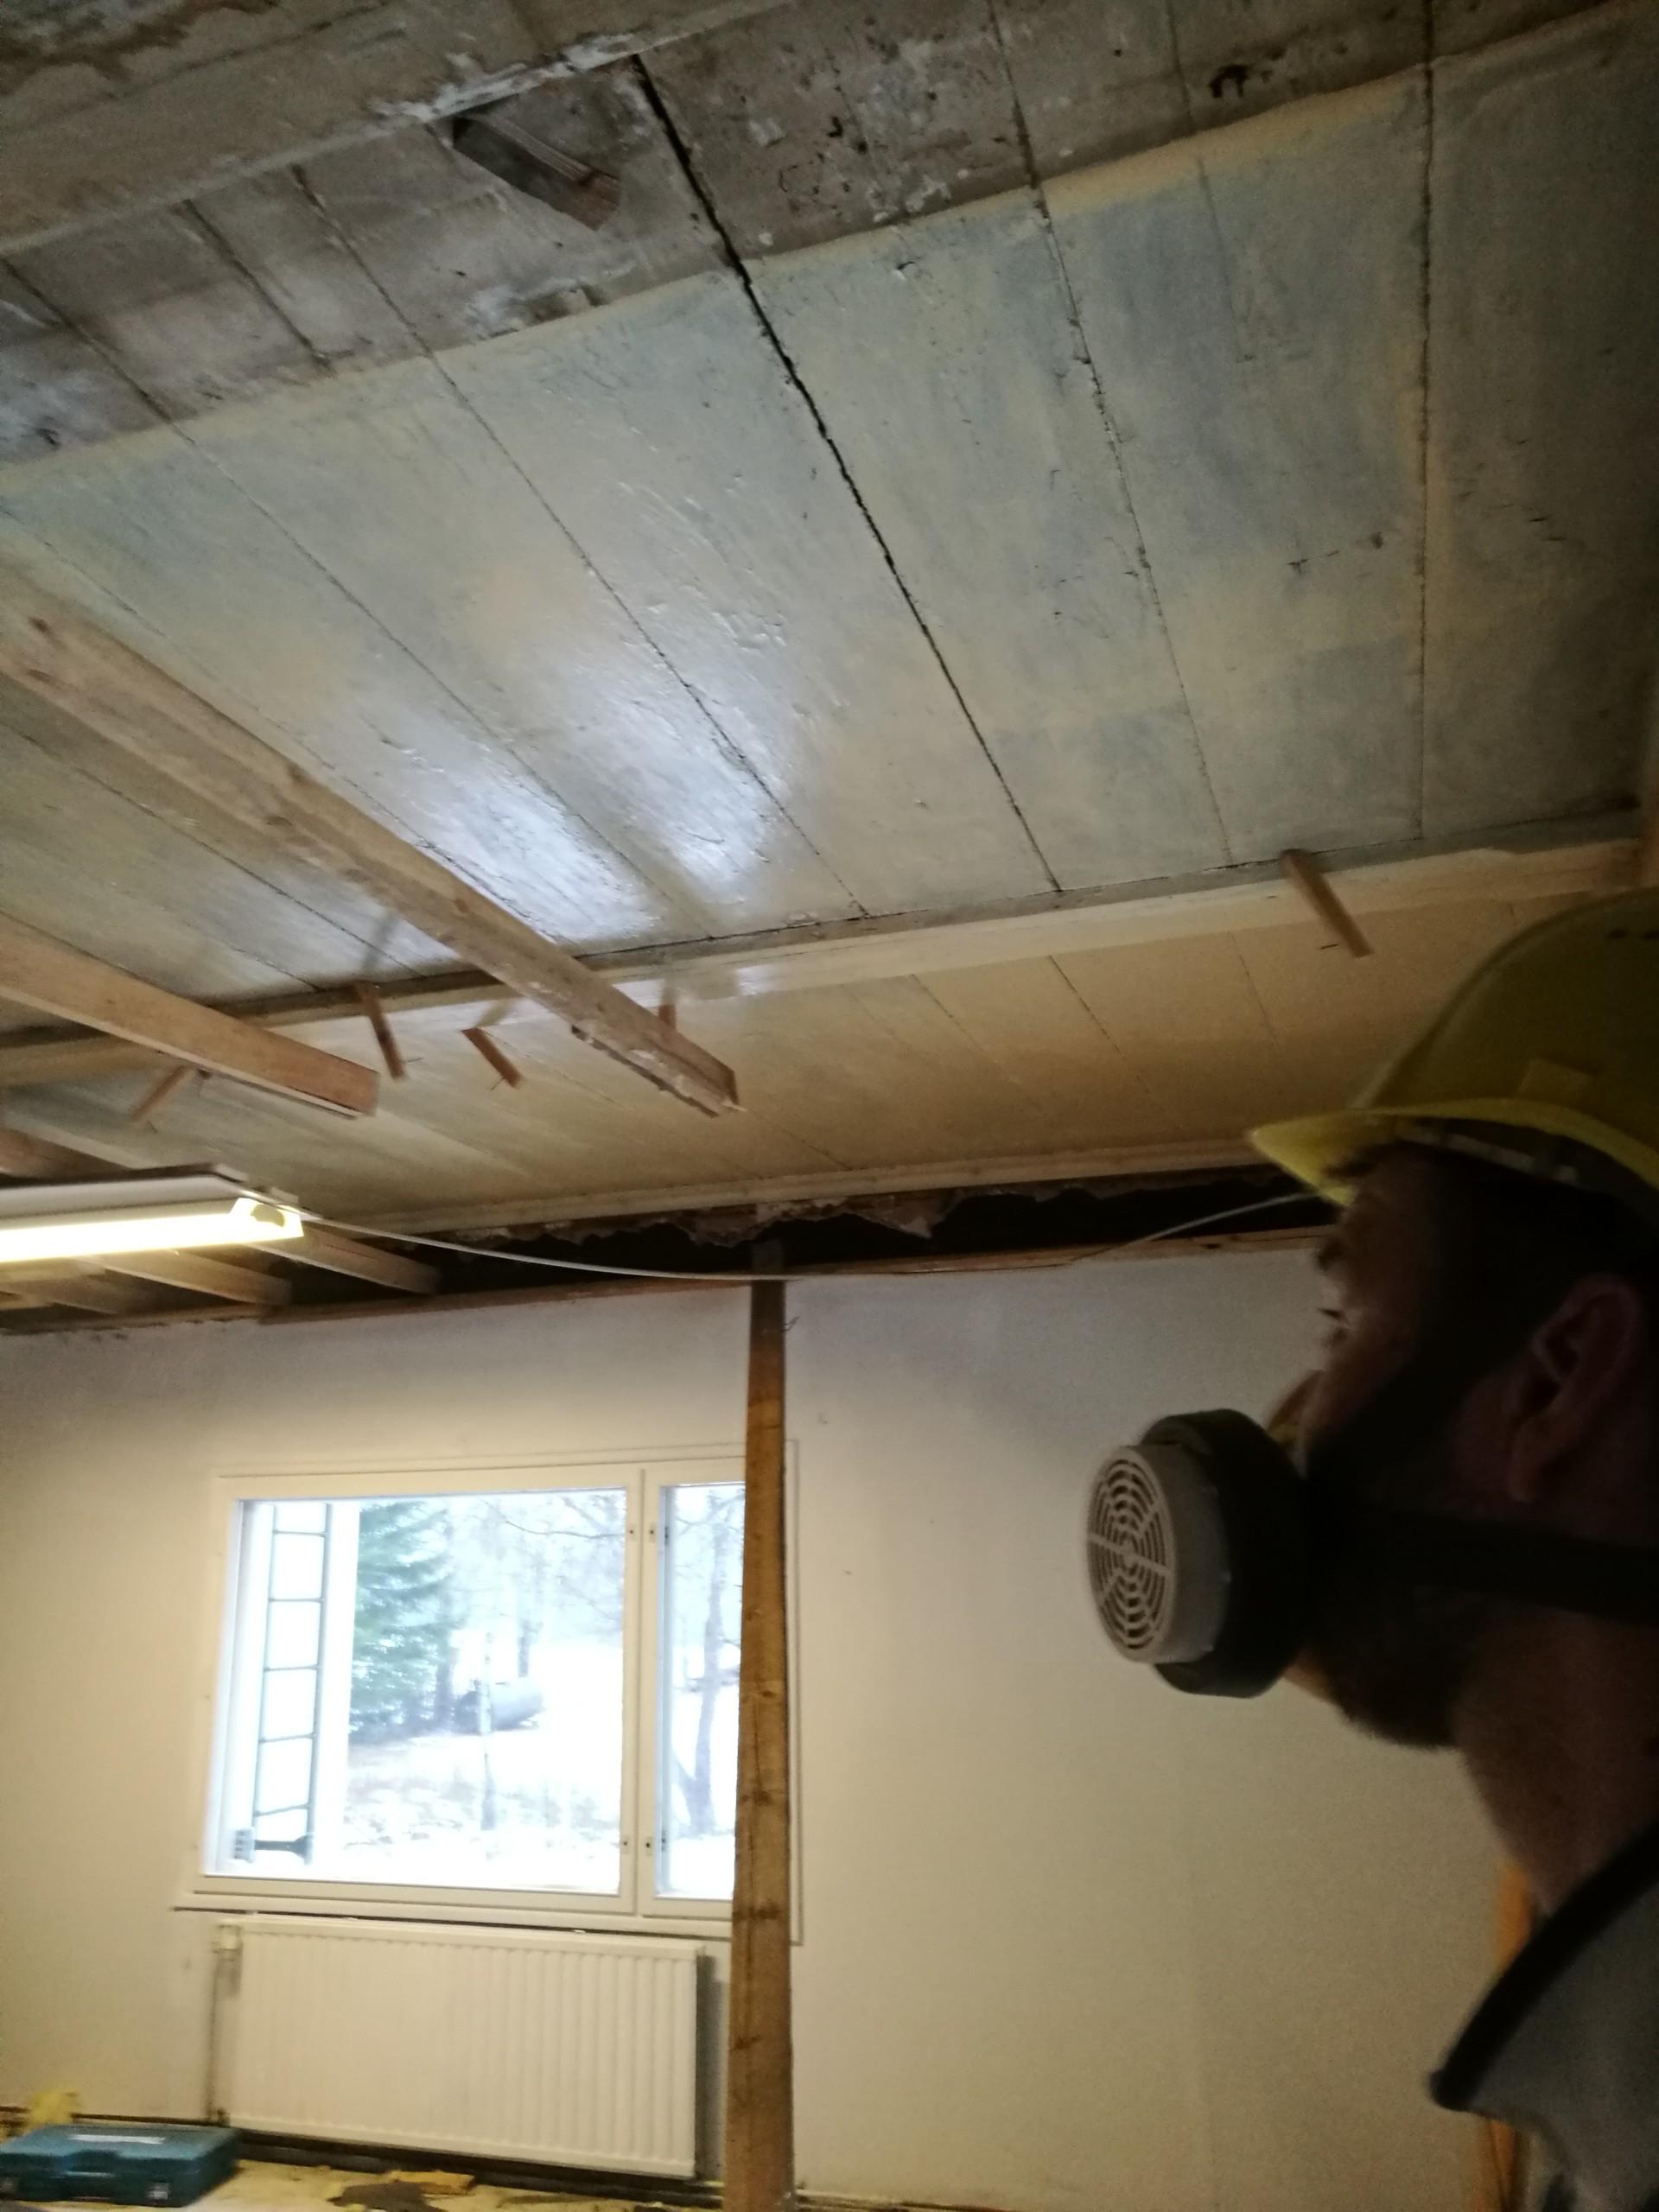 maatilan remontti - upea lankkusisäkatto paljastuu